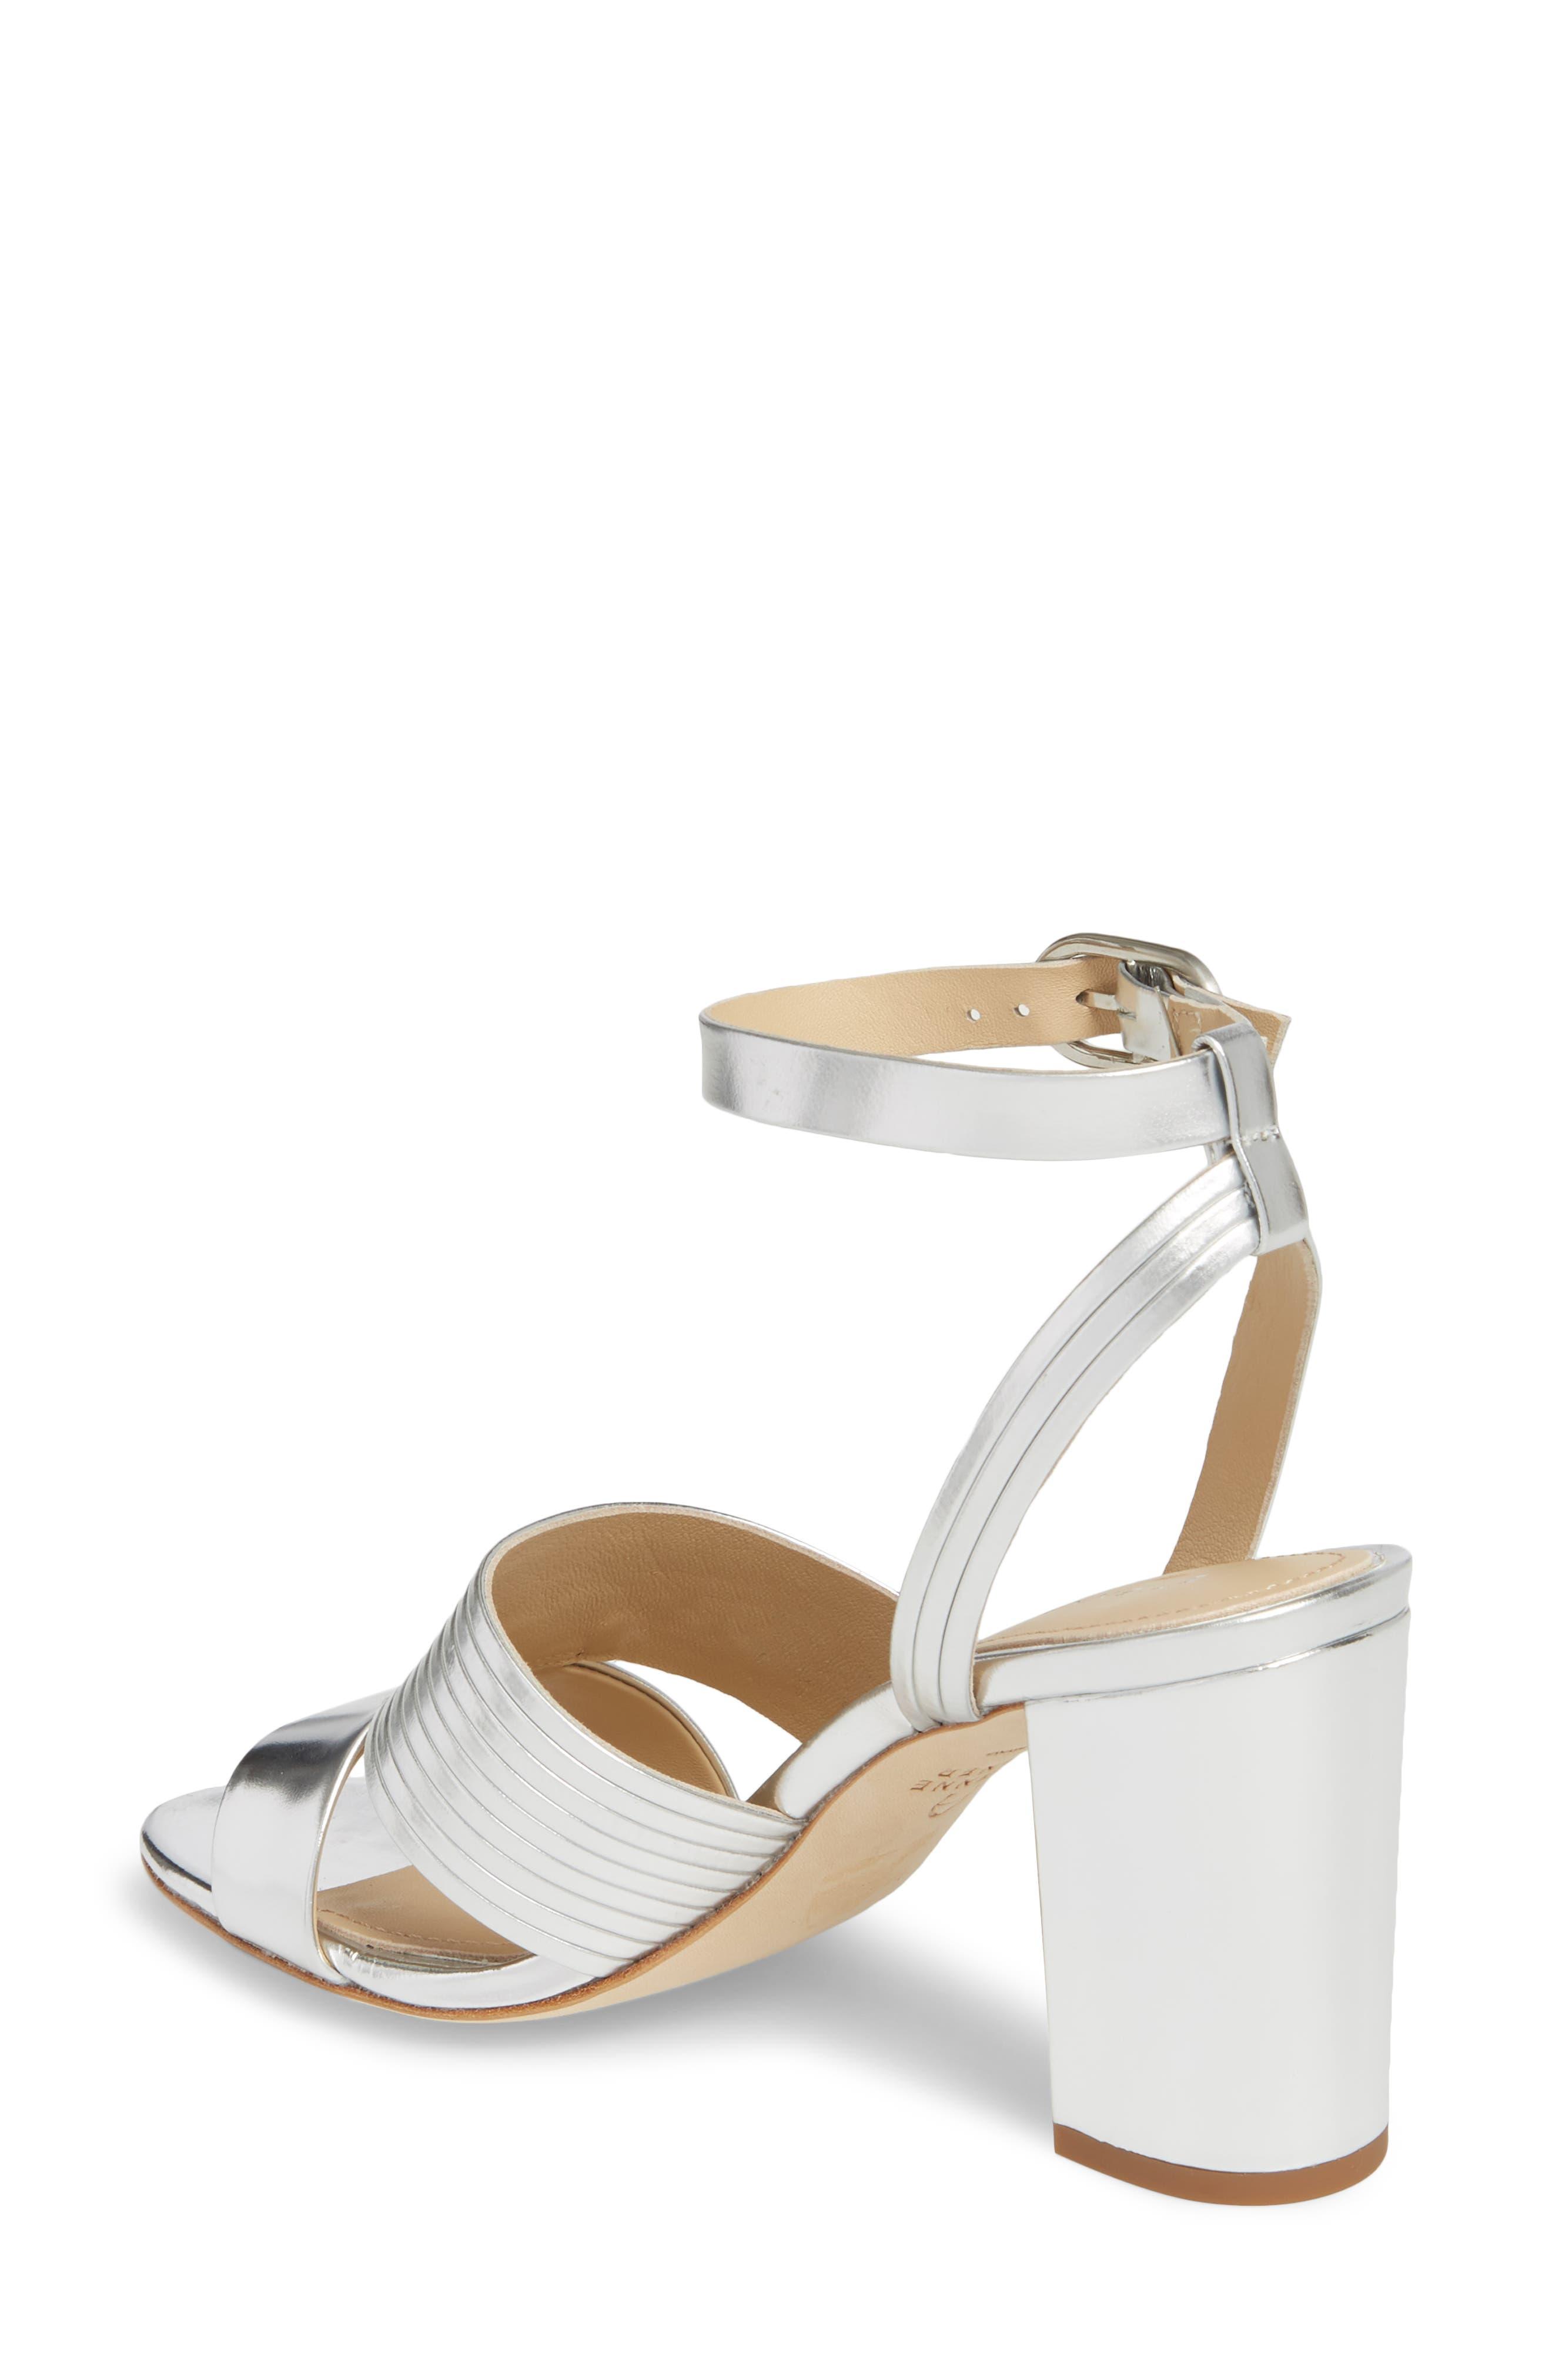 ETIENNE AIGNER,                             Layla Ankle Strap Sandal,                             Alternate thumbnail 2, color,                             040